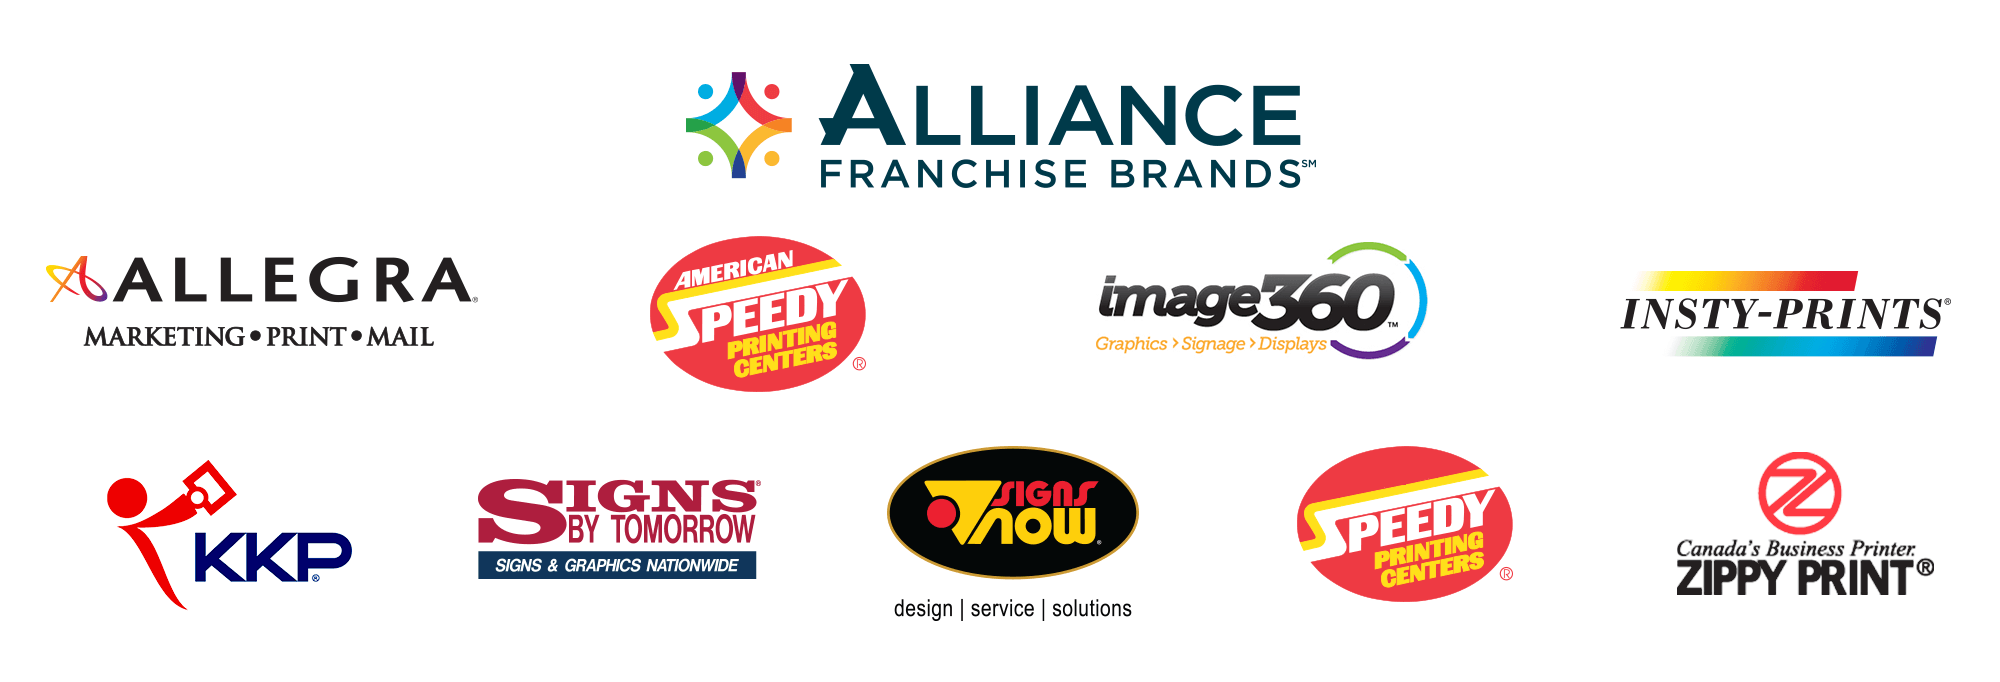 Alliance Brnds Logos